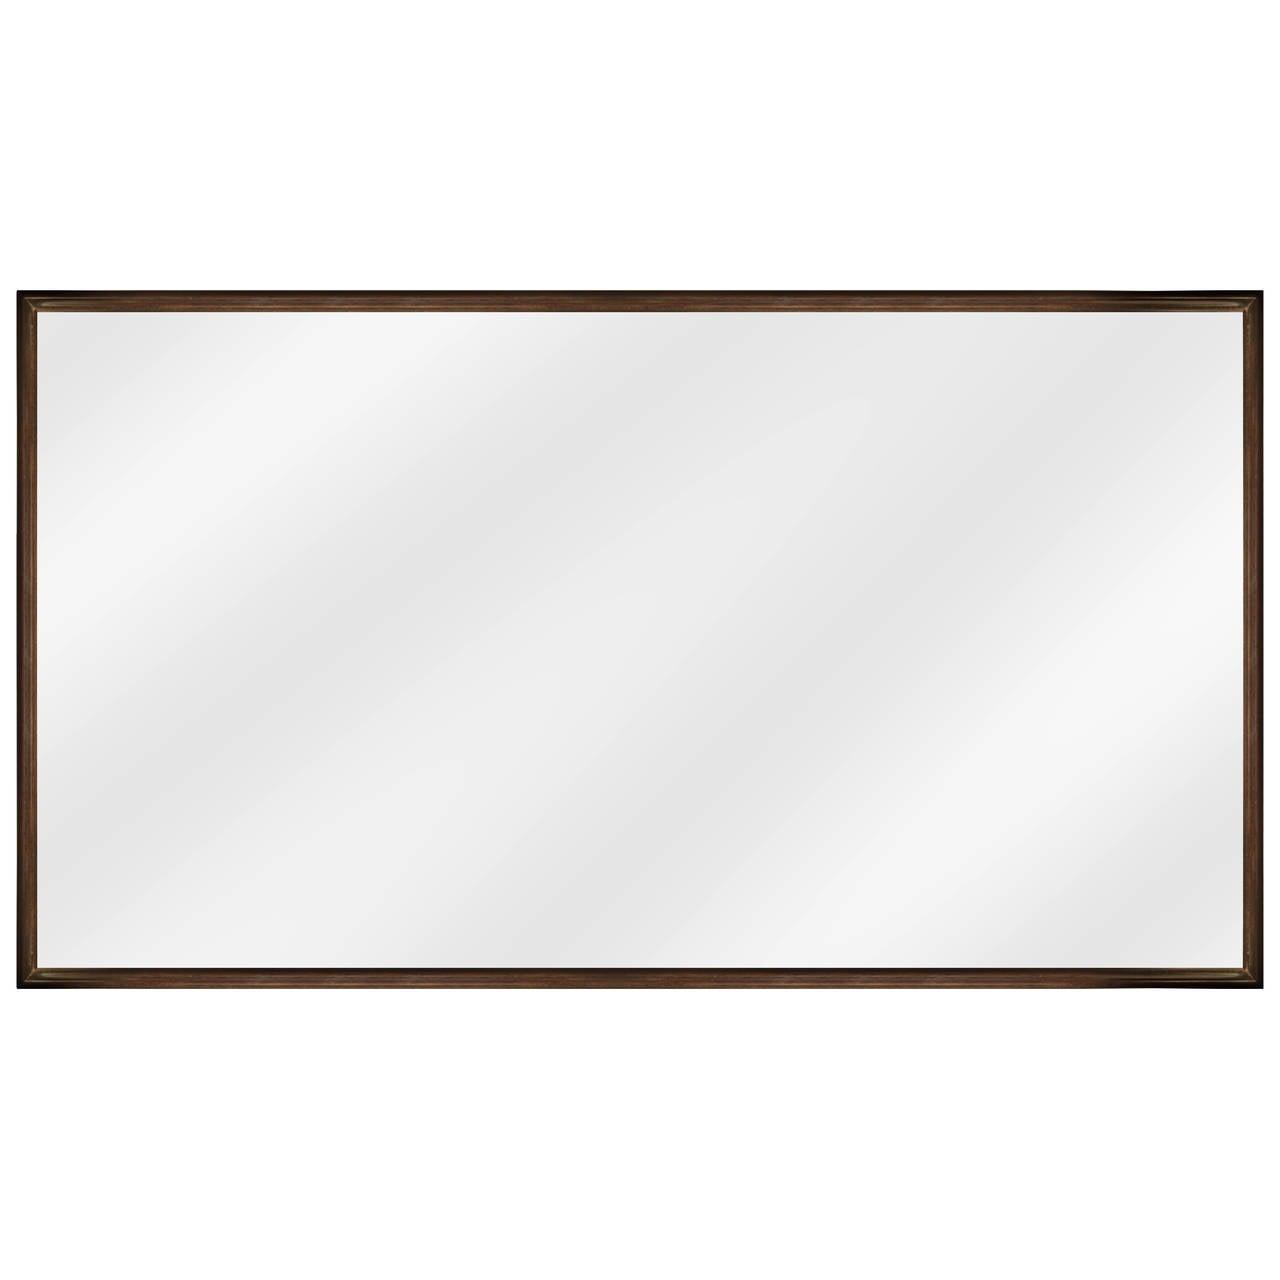 Elegant Mirror in Dark Walnut with Stepped Frame by T.H. Robsjohn-Gibbings